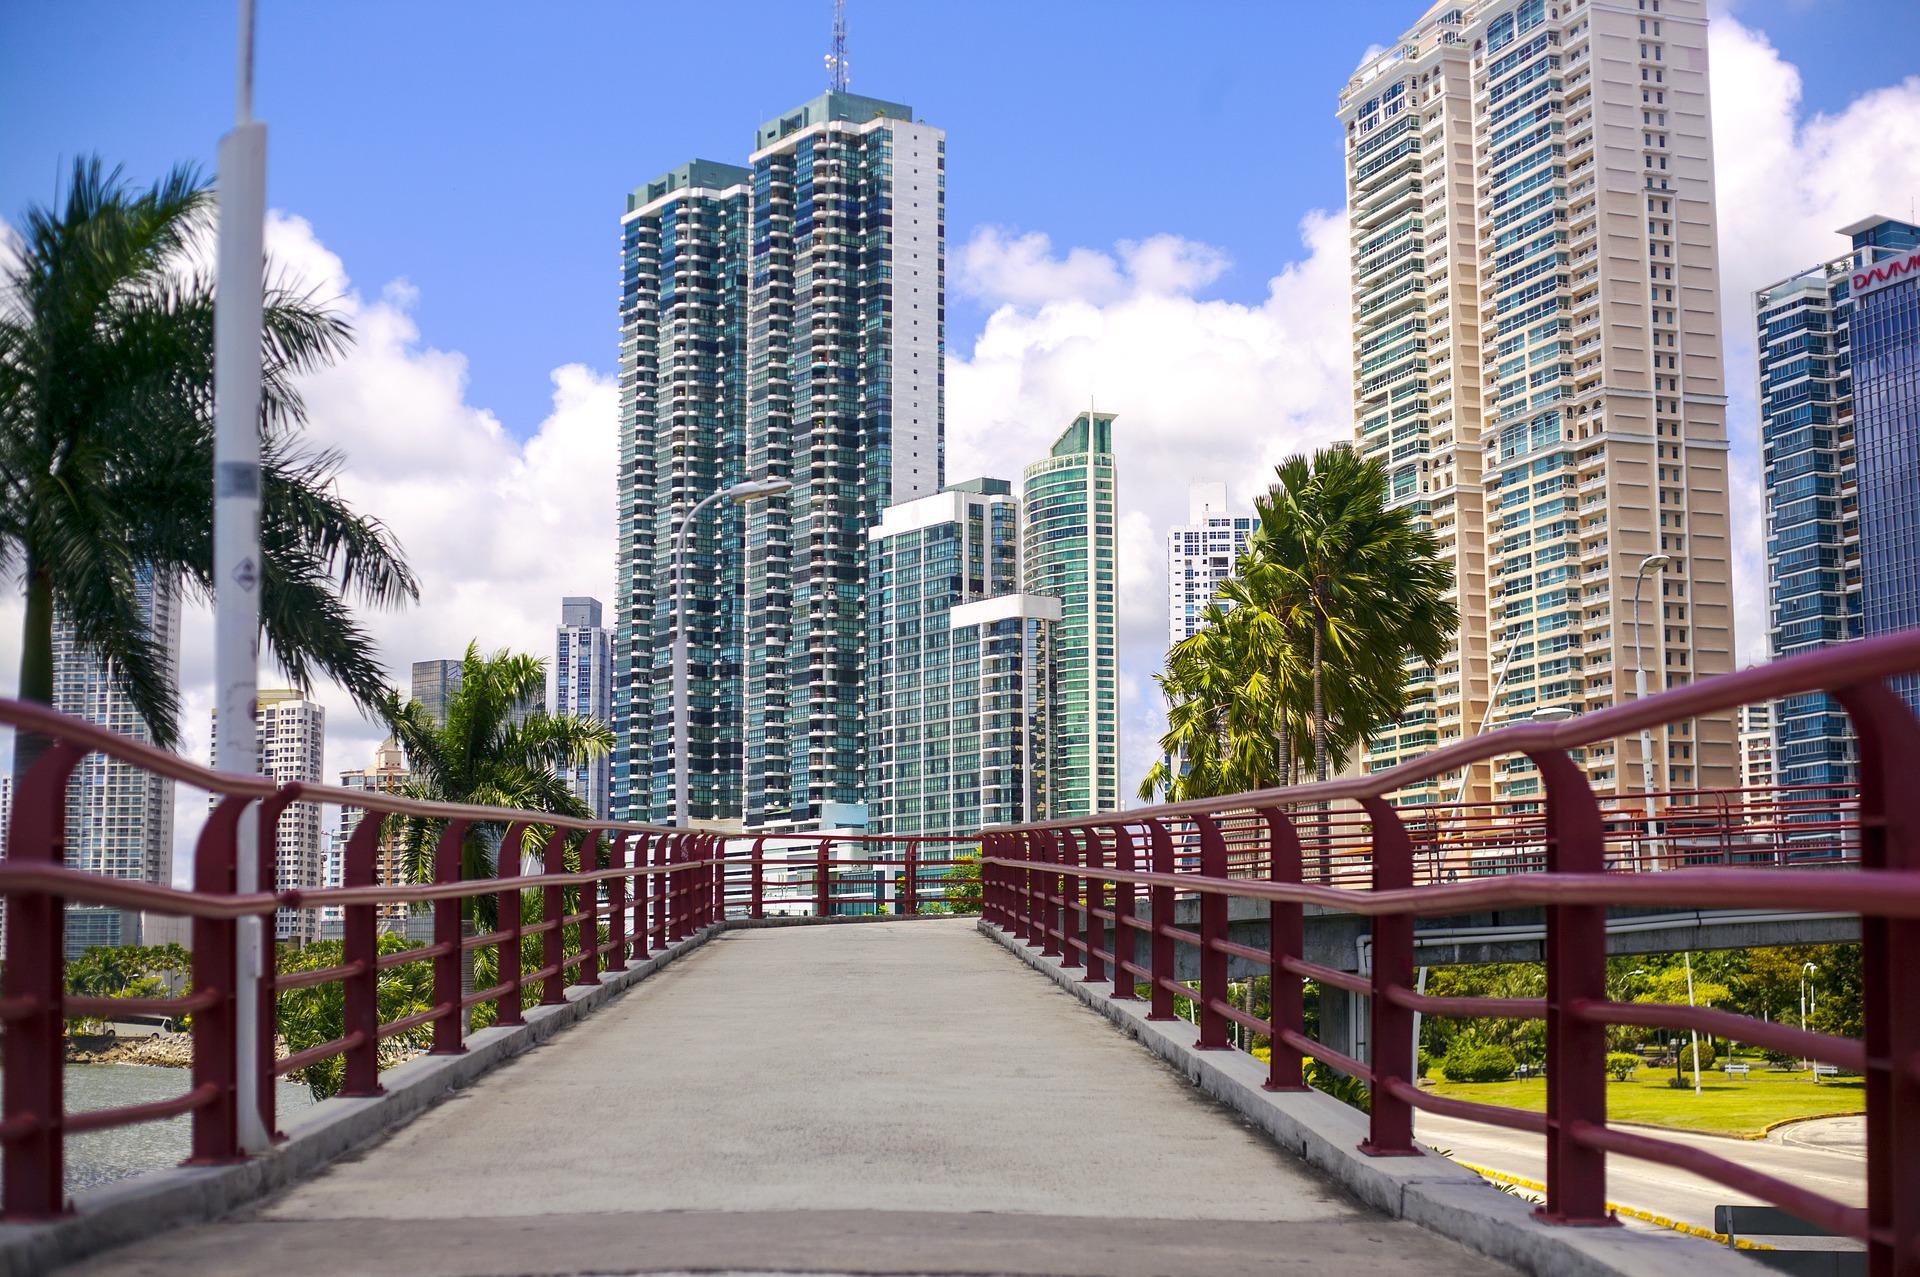 Urlaub in Panama City günstig - im 3 Sterne Hotel